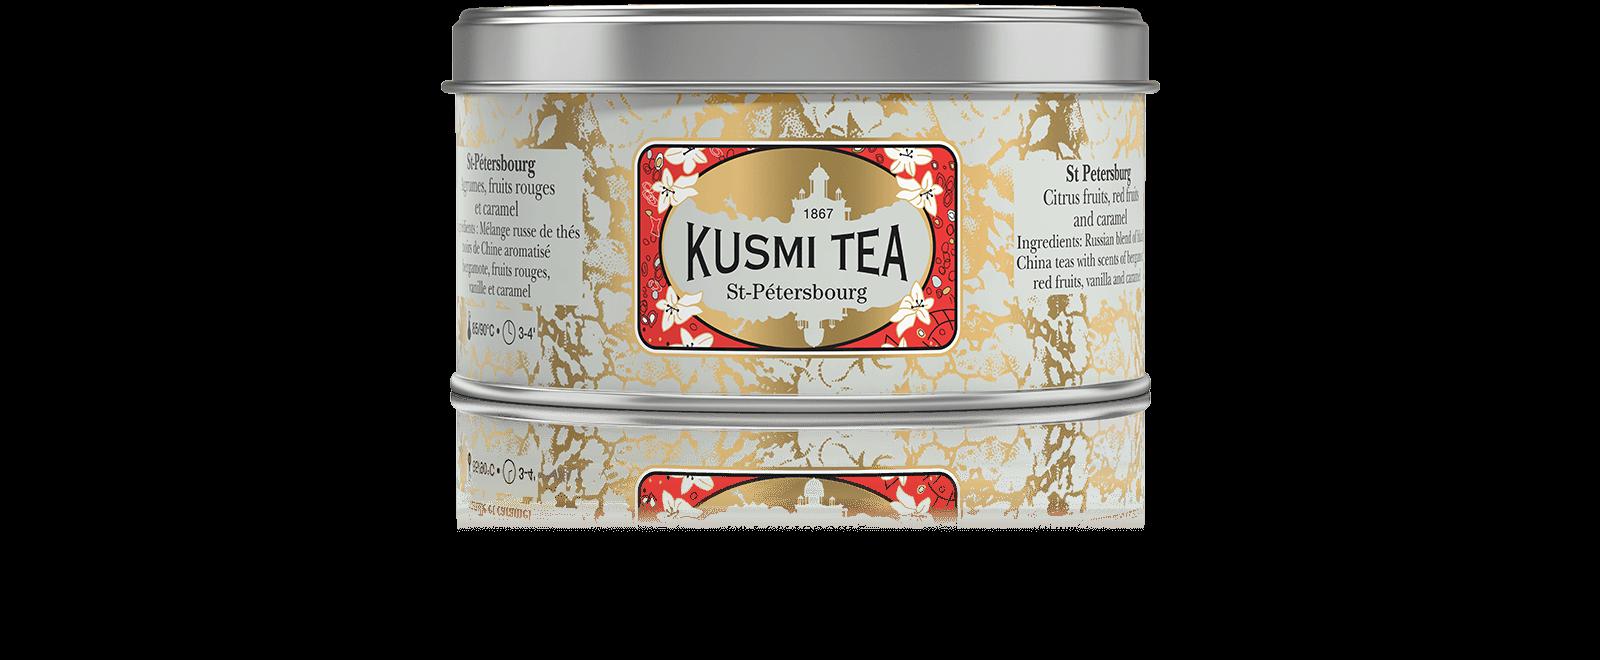 Earl Grey - St-Pétersbourg - Kusmi Tea